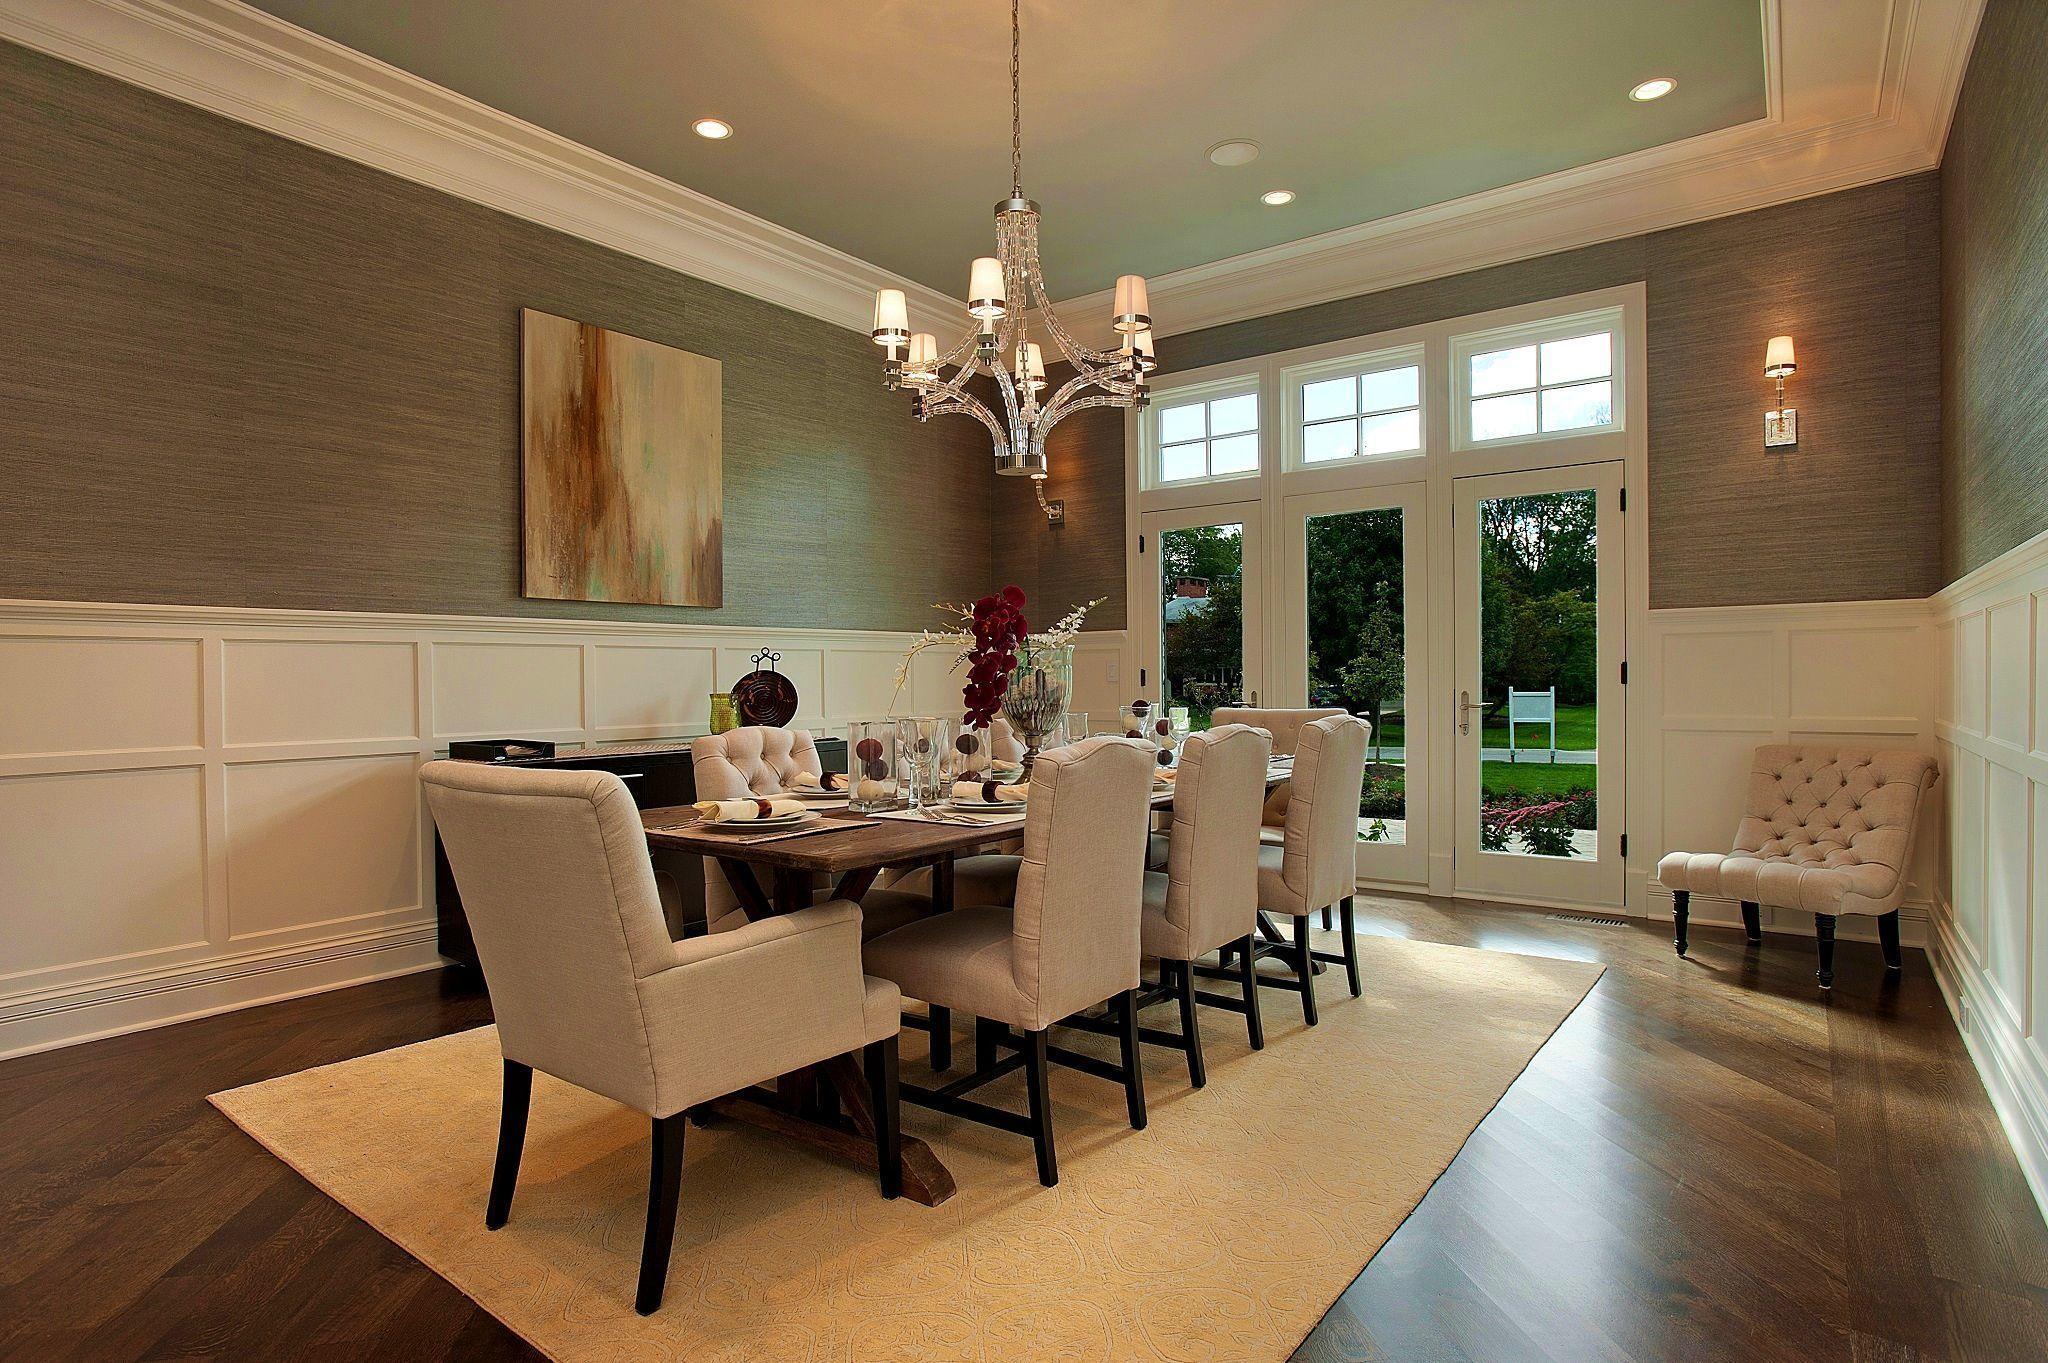 Furnitureastonishing Formal Dining Room Furniture Decor And Ideas House Large